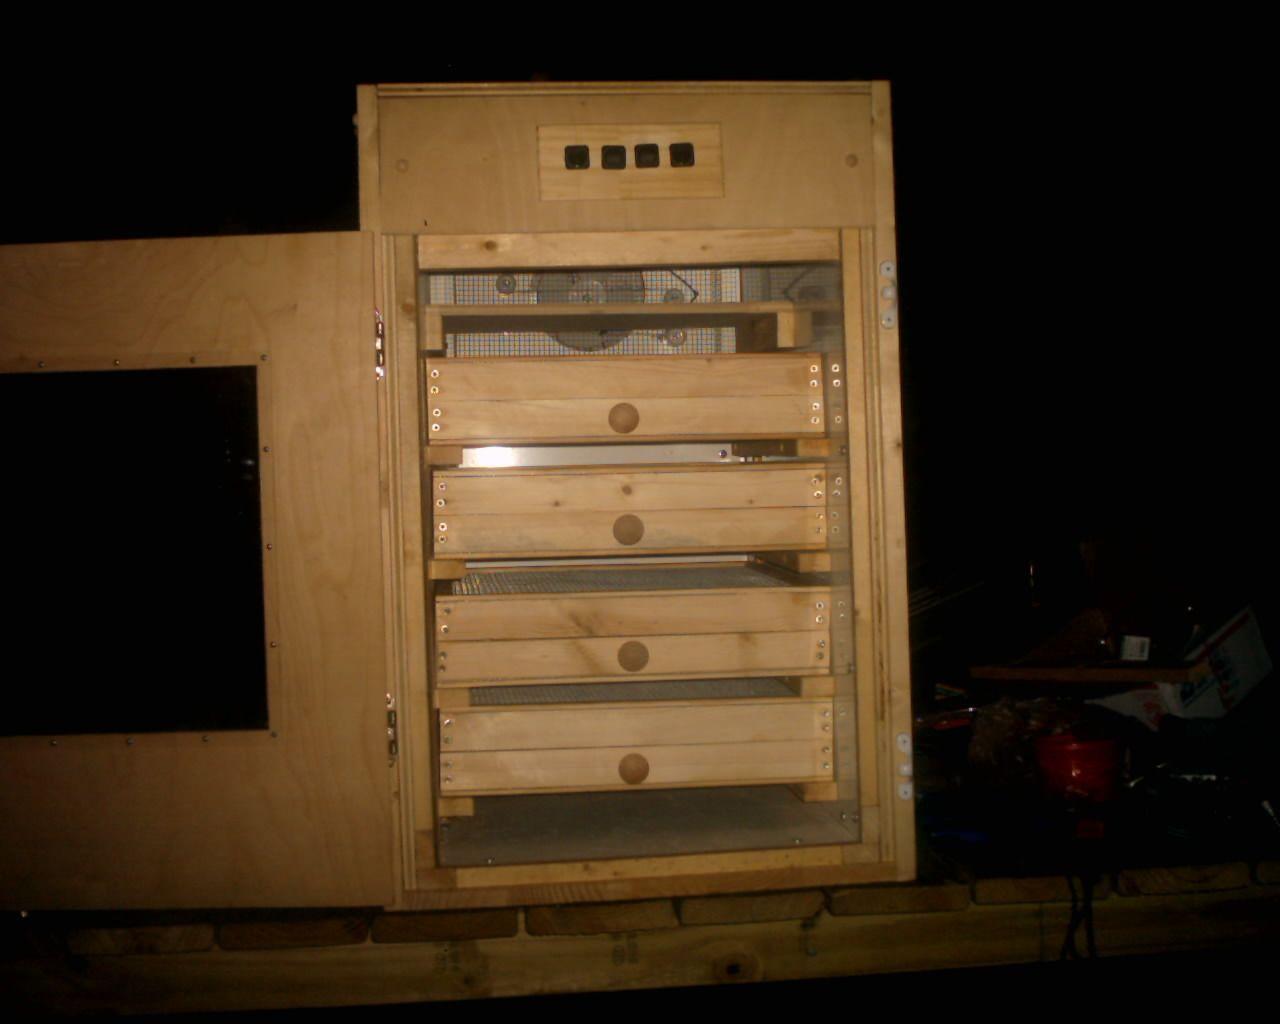 Cabinet Incubator Kit Diy Incubator Plans Diy Projects